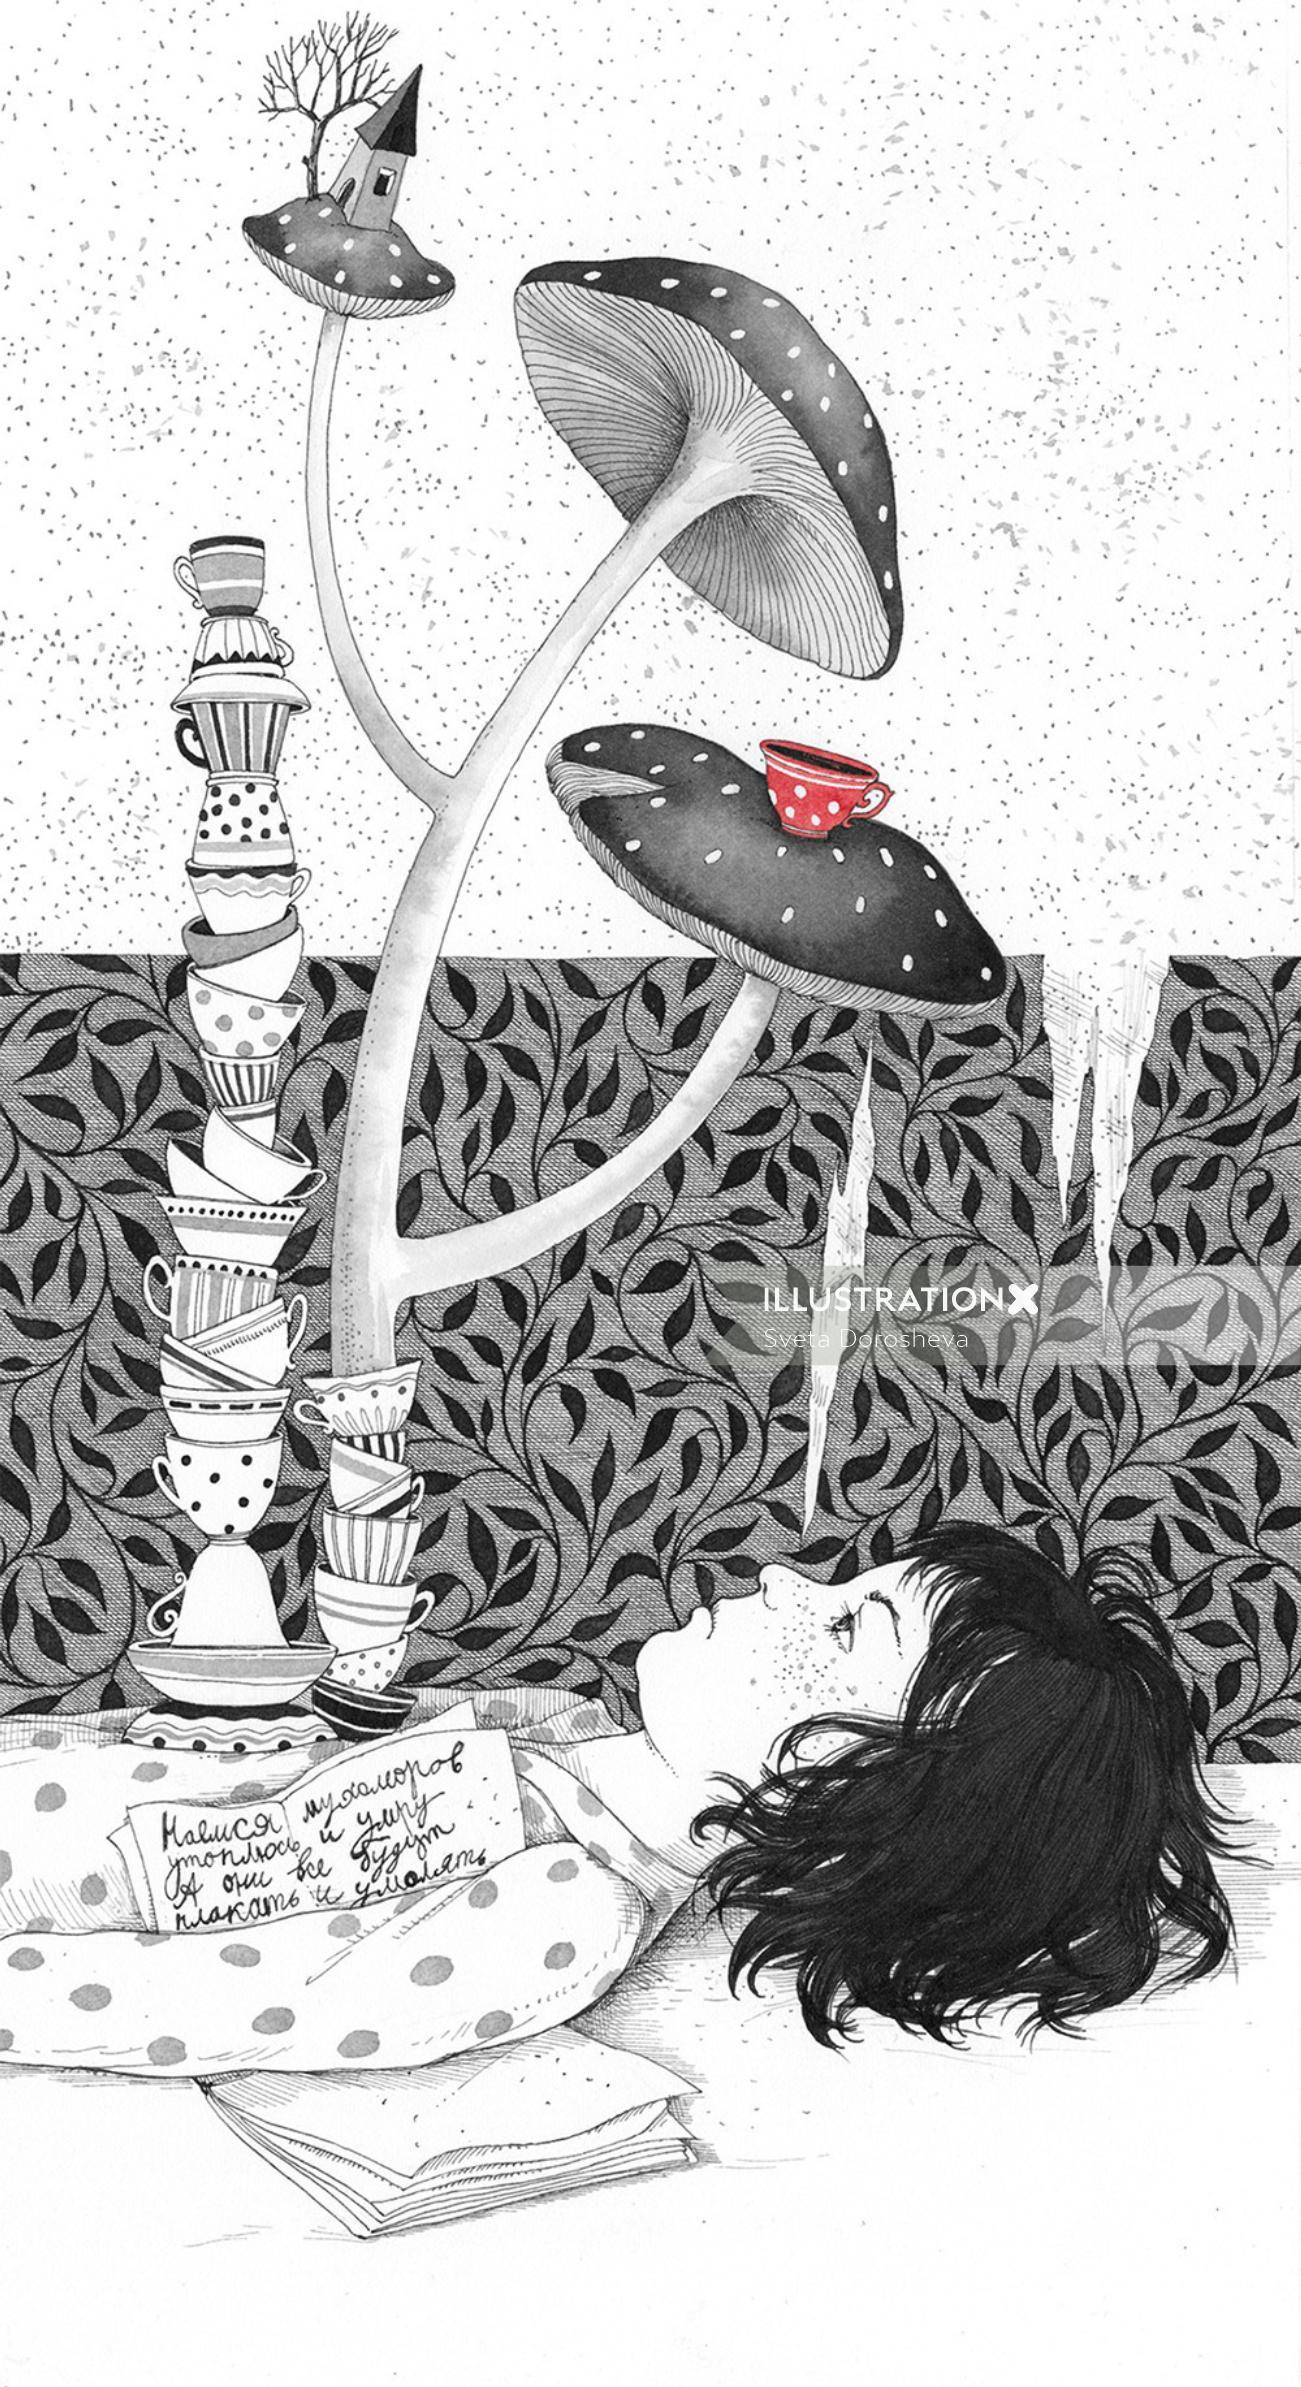 Black & white sketch of a girl